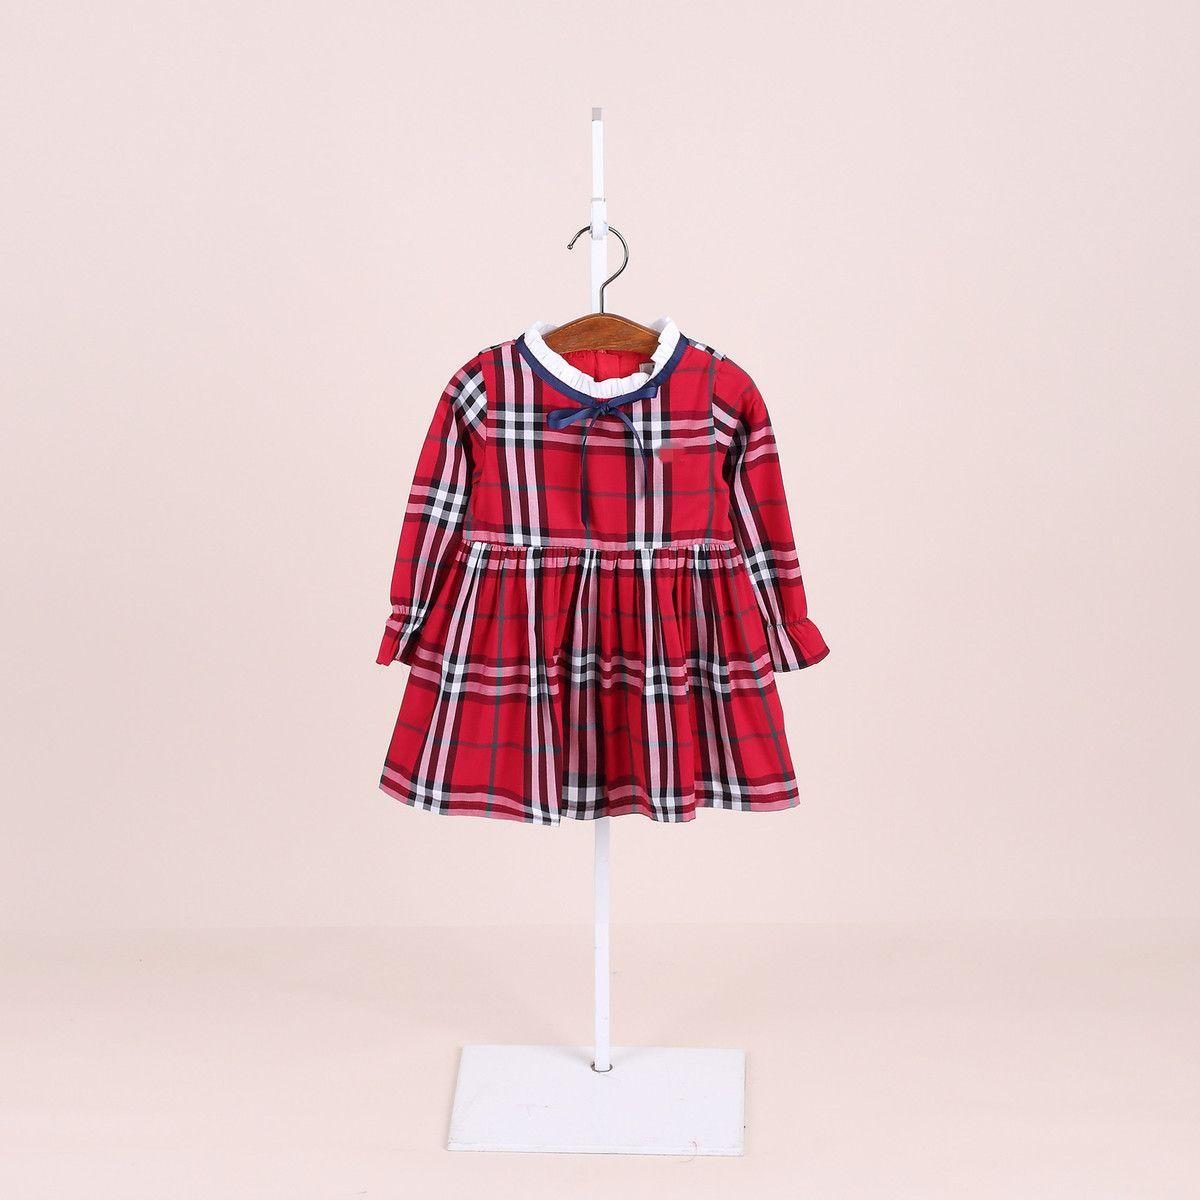 e11c1a62f01e 2019 2018 Girl Skirt Cotton Spring Autumn Children S Clothes Korean Edition  Princess Polychromatic Lattice Pure Children Dress Knee Length From ...